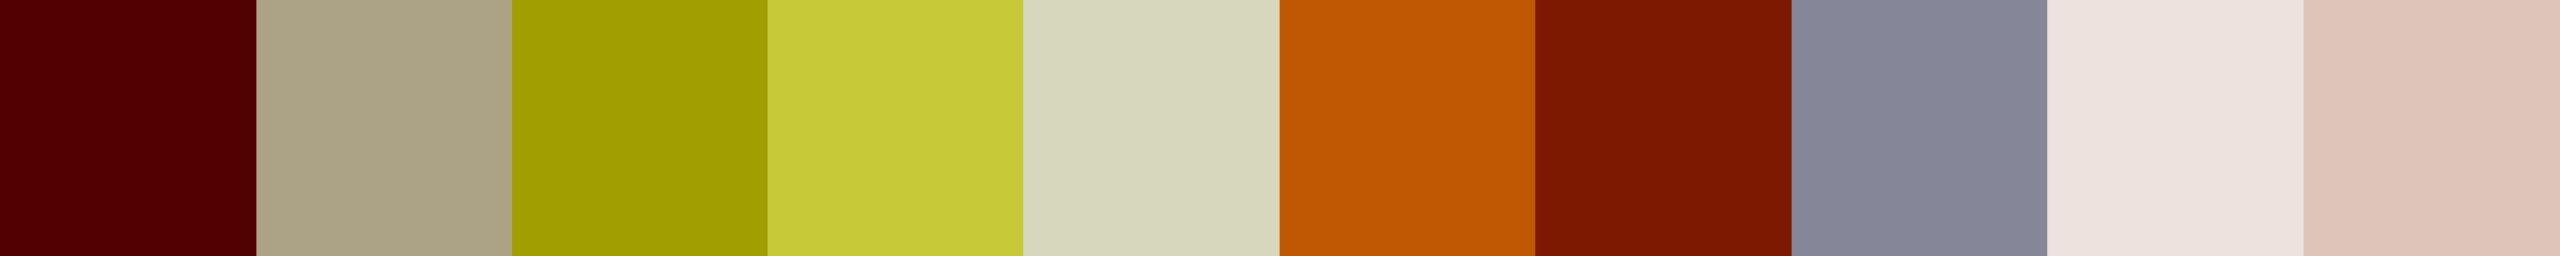 87 Quiria Color Palette